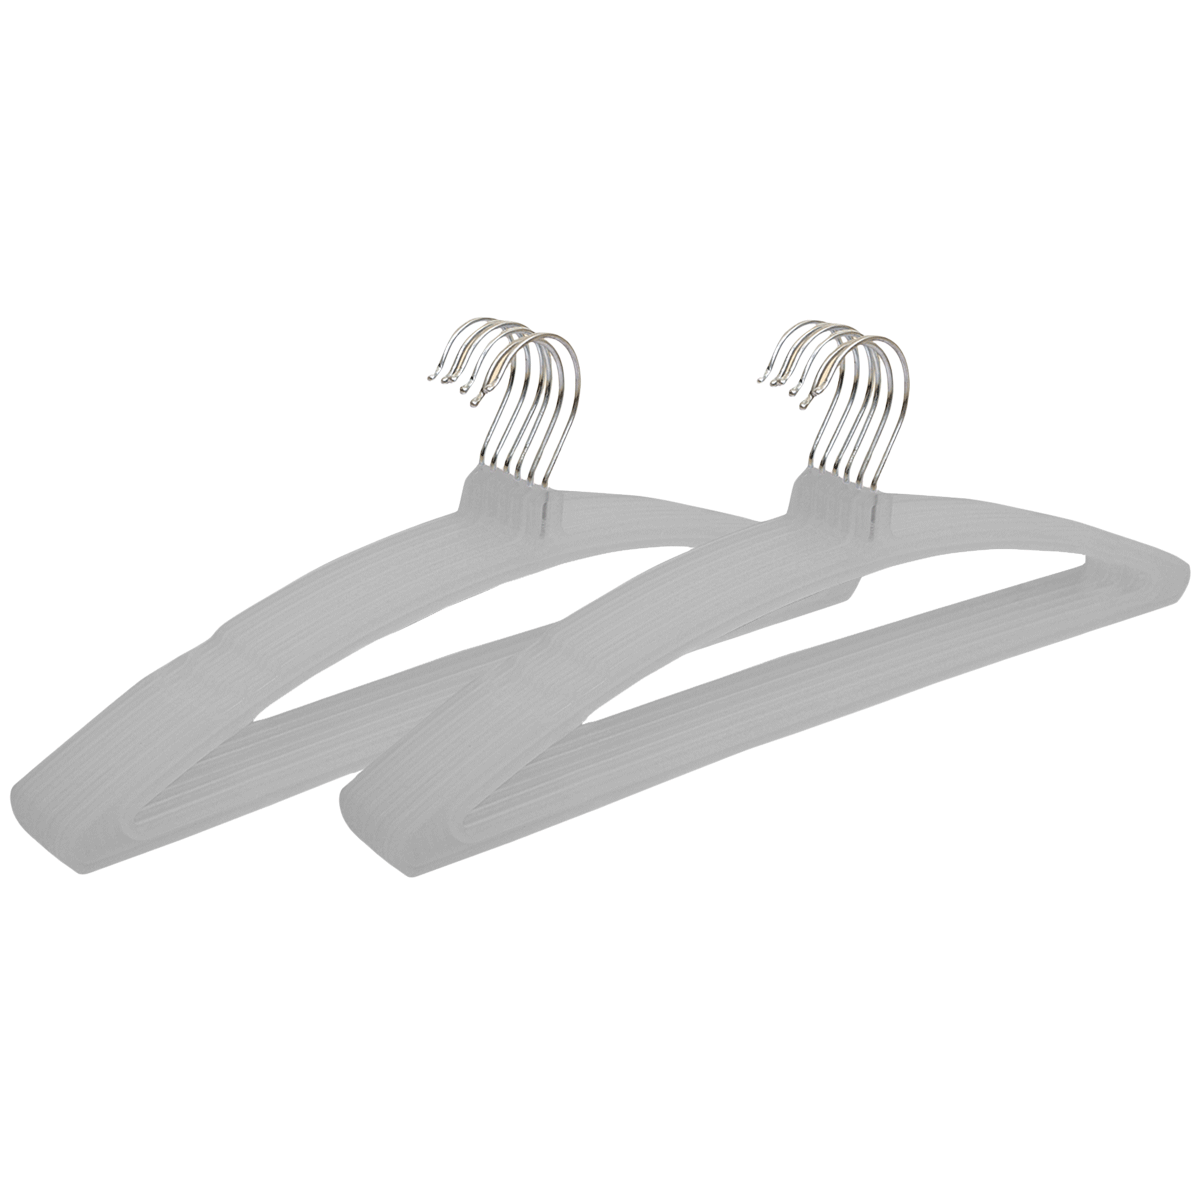 Kuber Industries Plastic 12 Pieces Hangers (Ultra-slim Profile, CTHANG010, Grey)_1